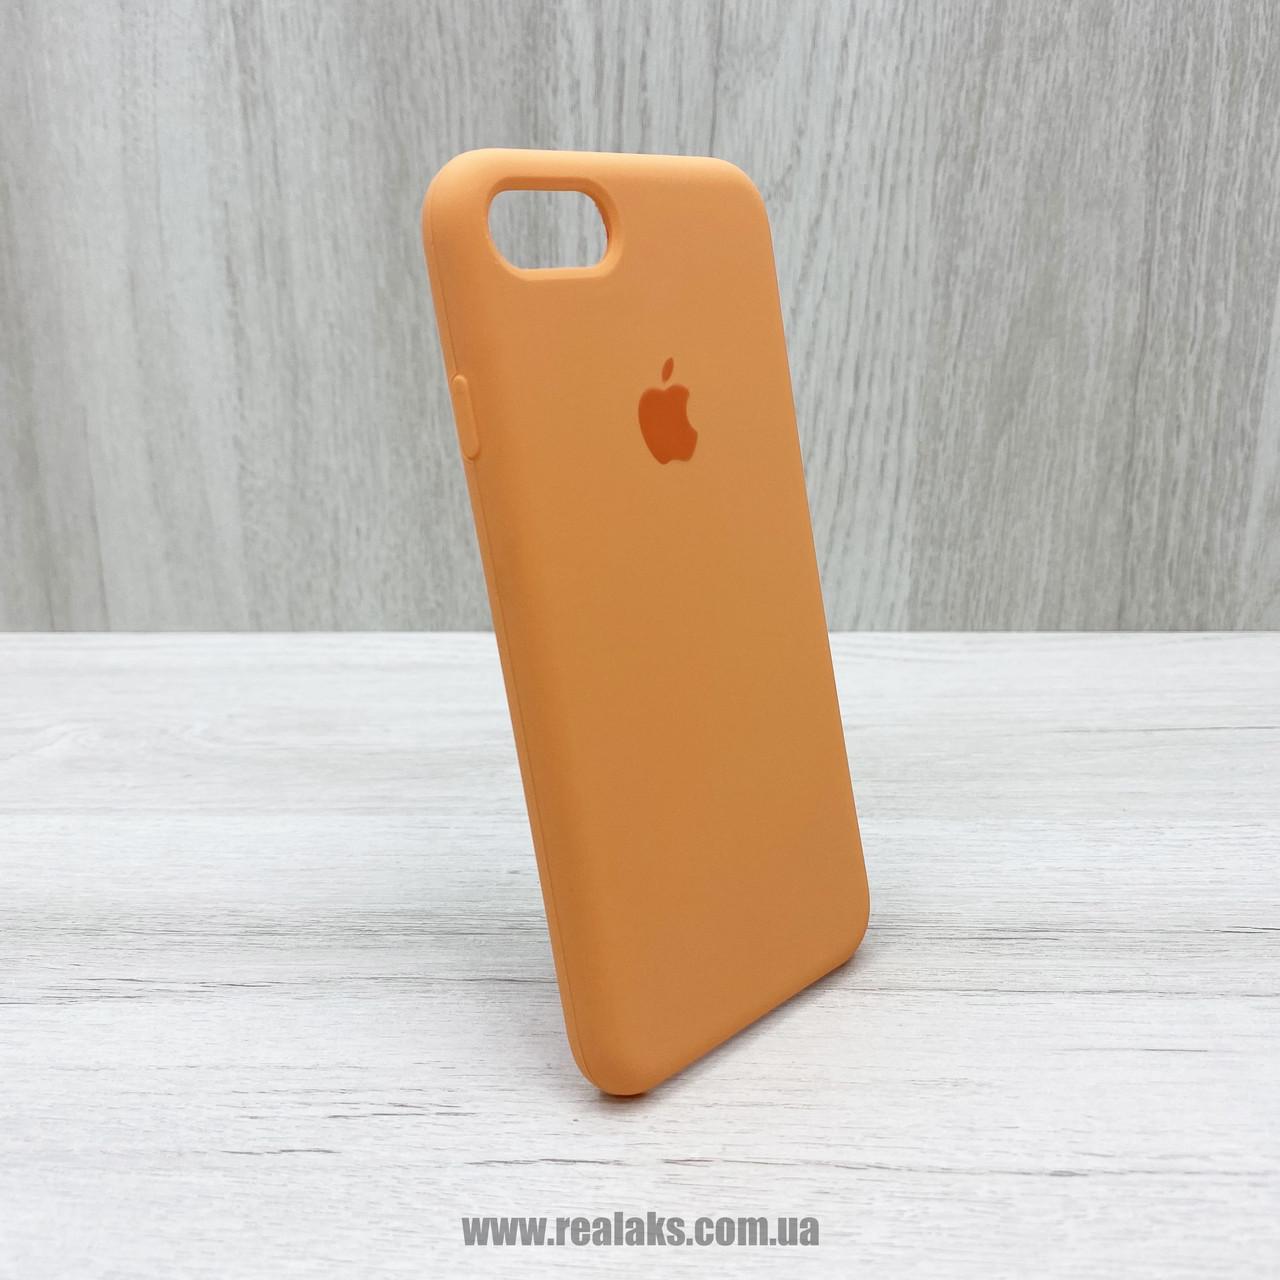 Чехол SC для Apple iPhone 7 & iPhone 8 Orange